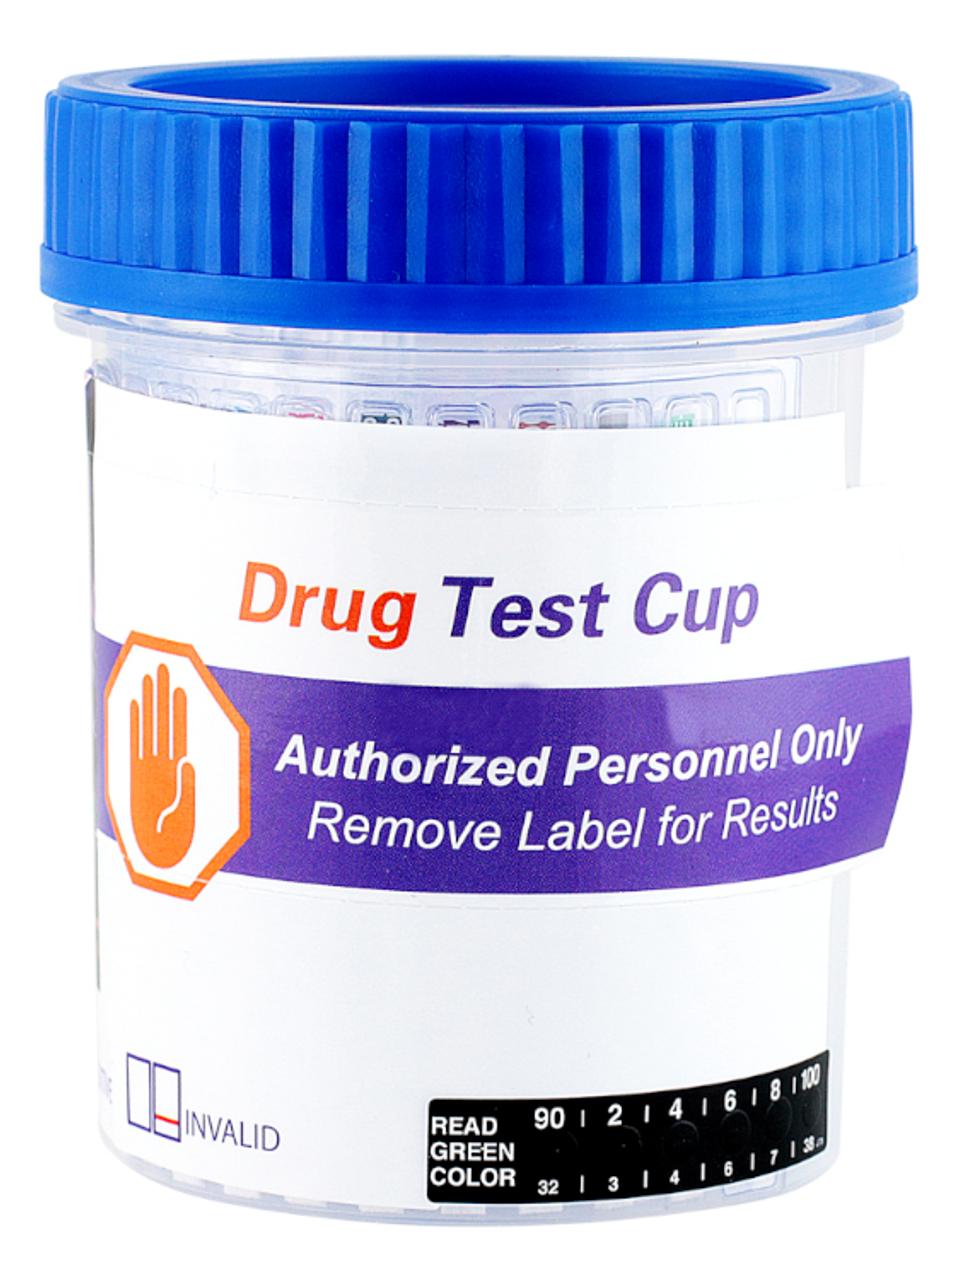 Healgen 16 Panel Urine Drug Test Cup with Alcohol ETG, FEN Fentanyl, K2 Spice, TRA Tramadol